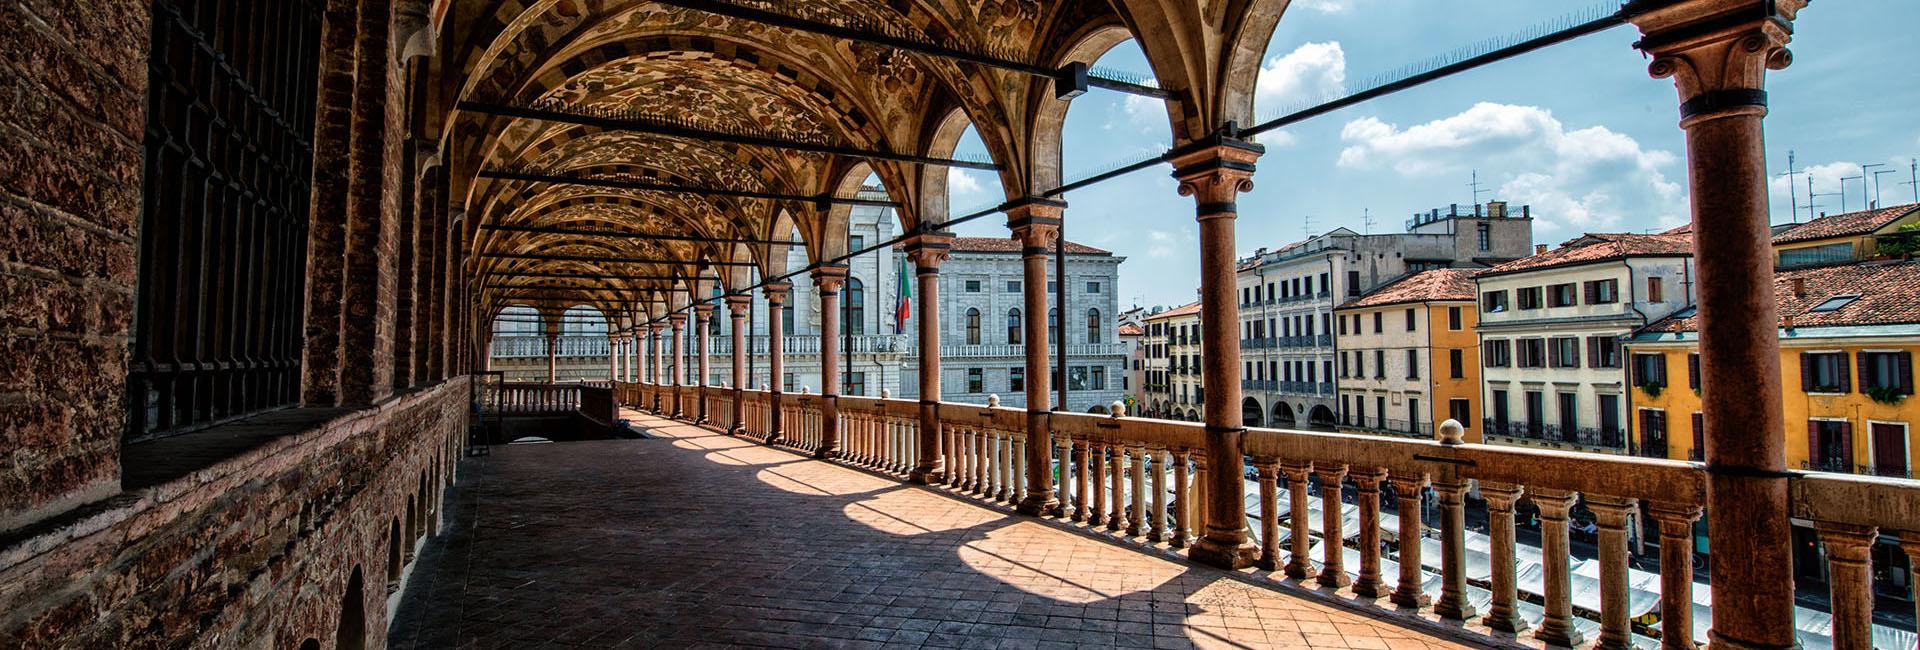 Padova Weekend Palazzo della Ragione